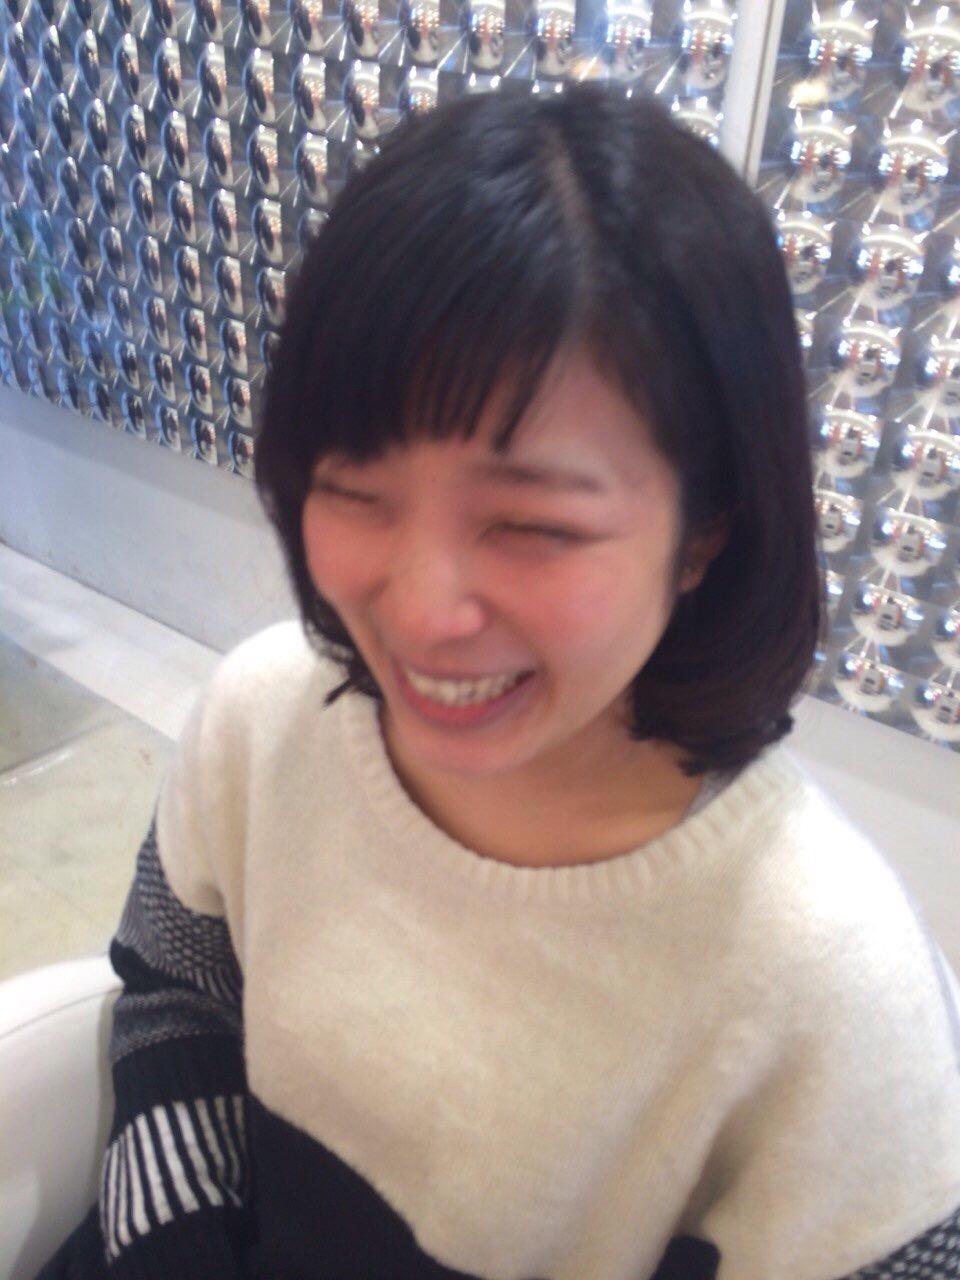 IMG_5137-0.JPG